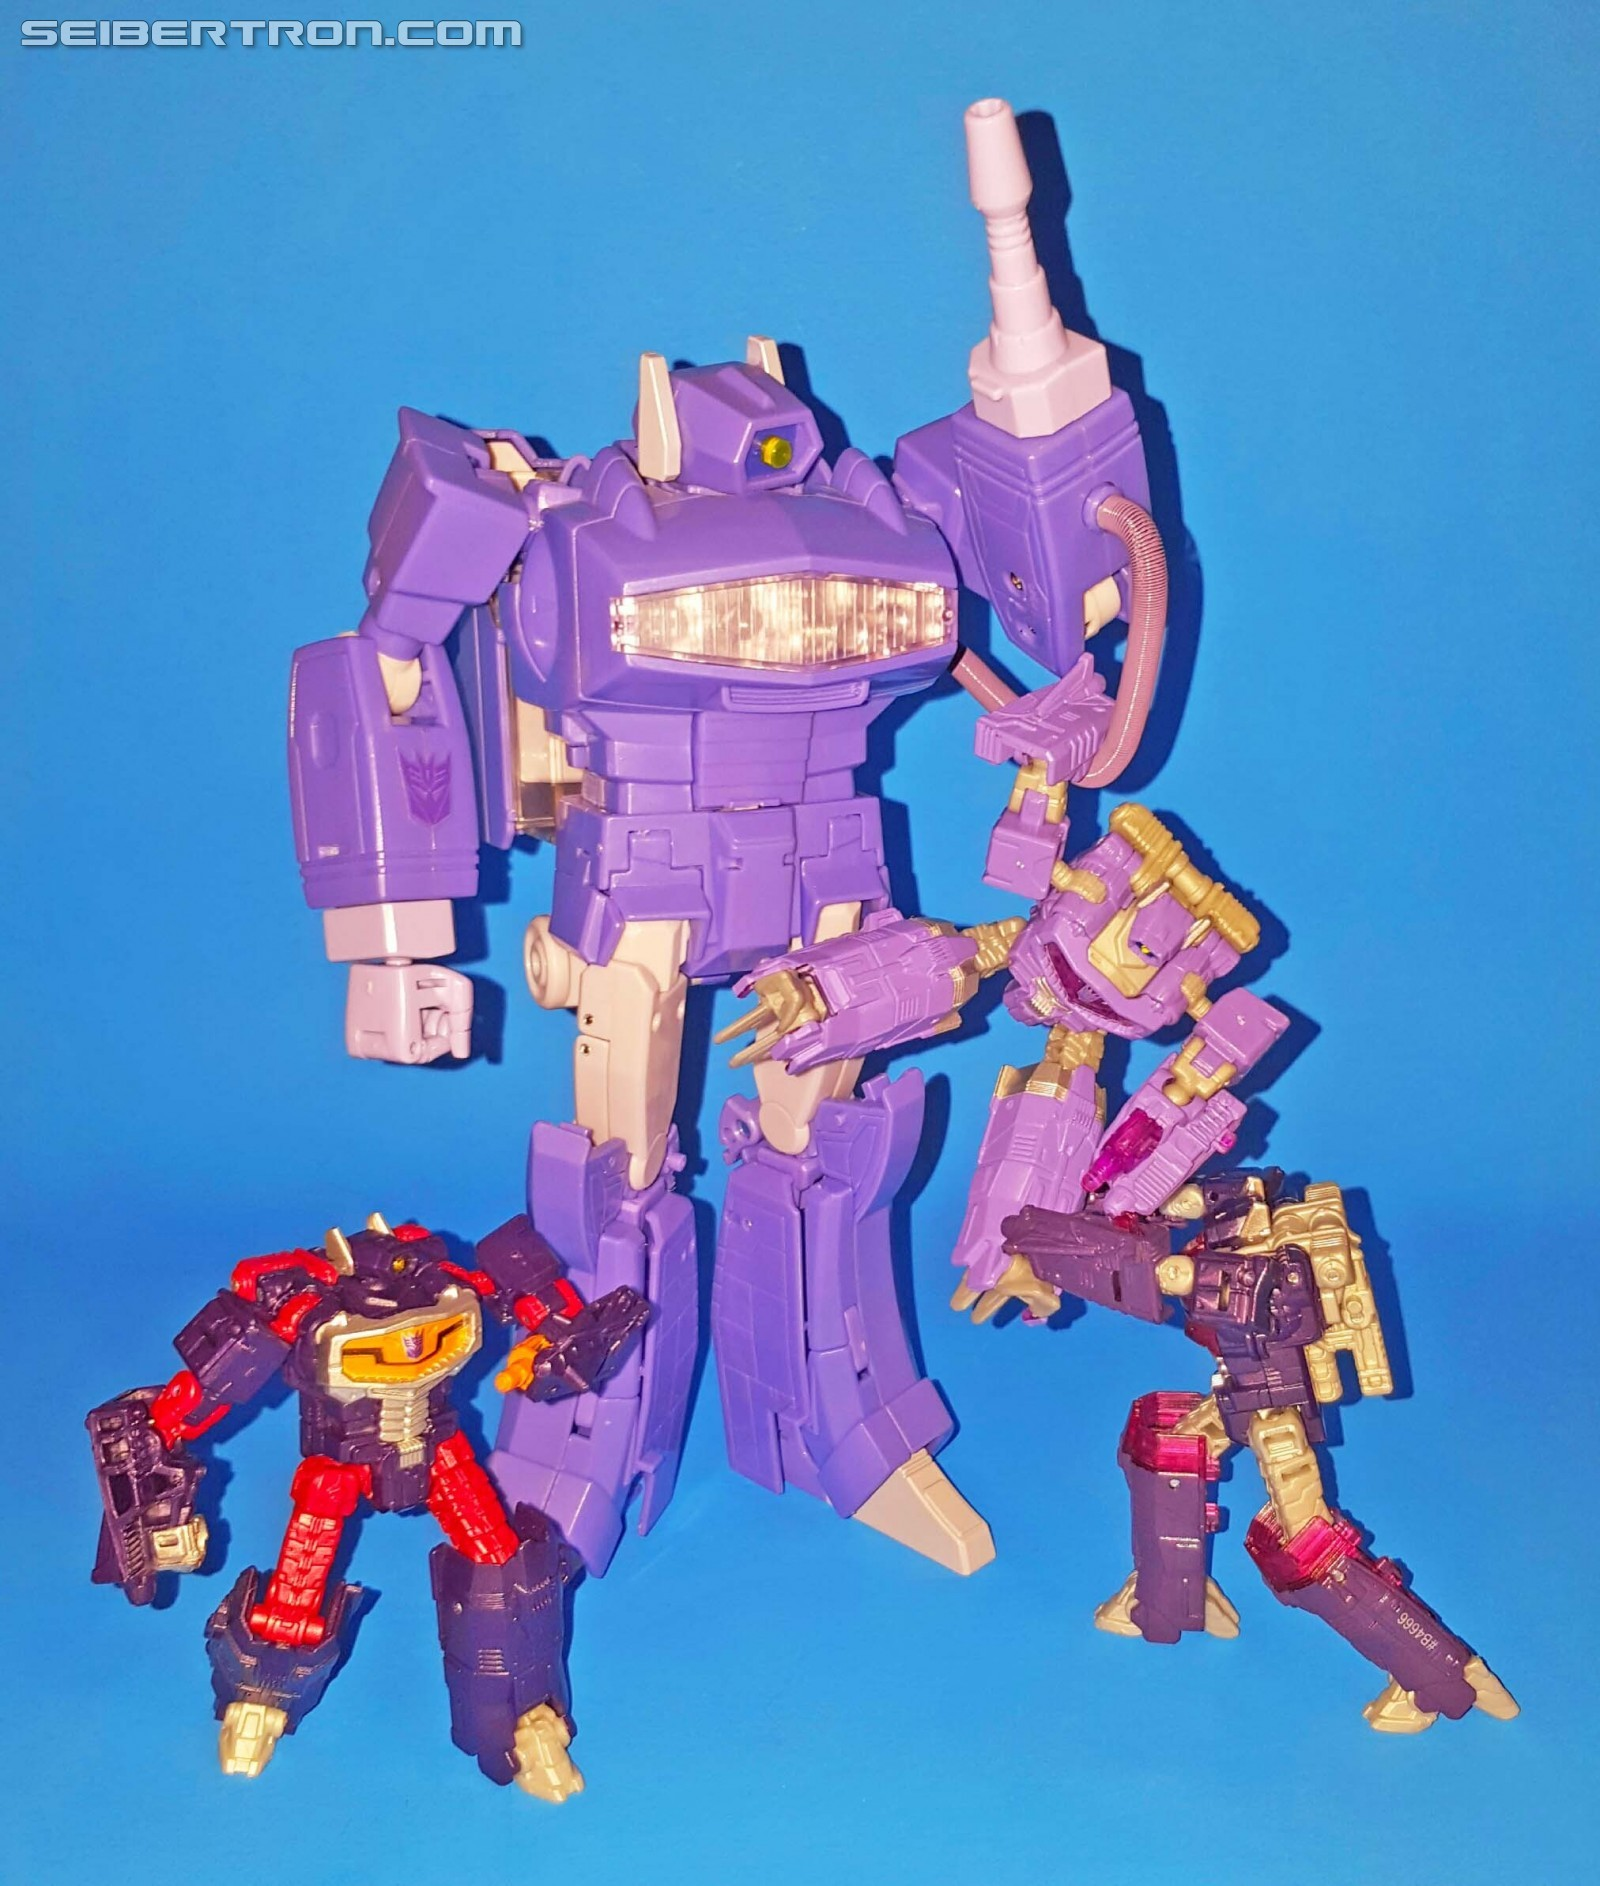 B4666 par Hasbro Transformers generations combineur wars legends class shockwave